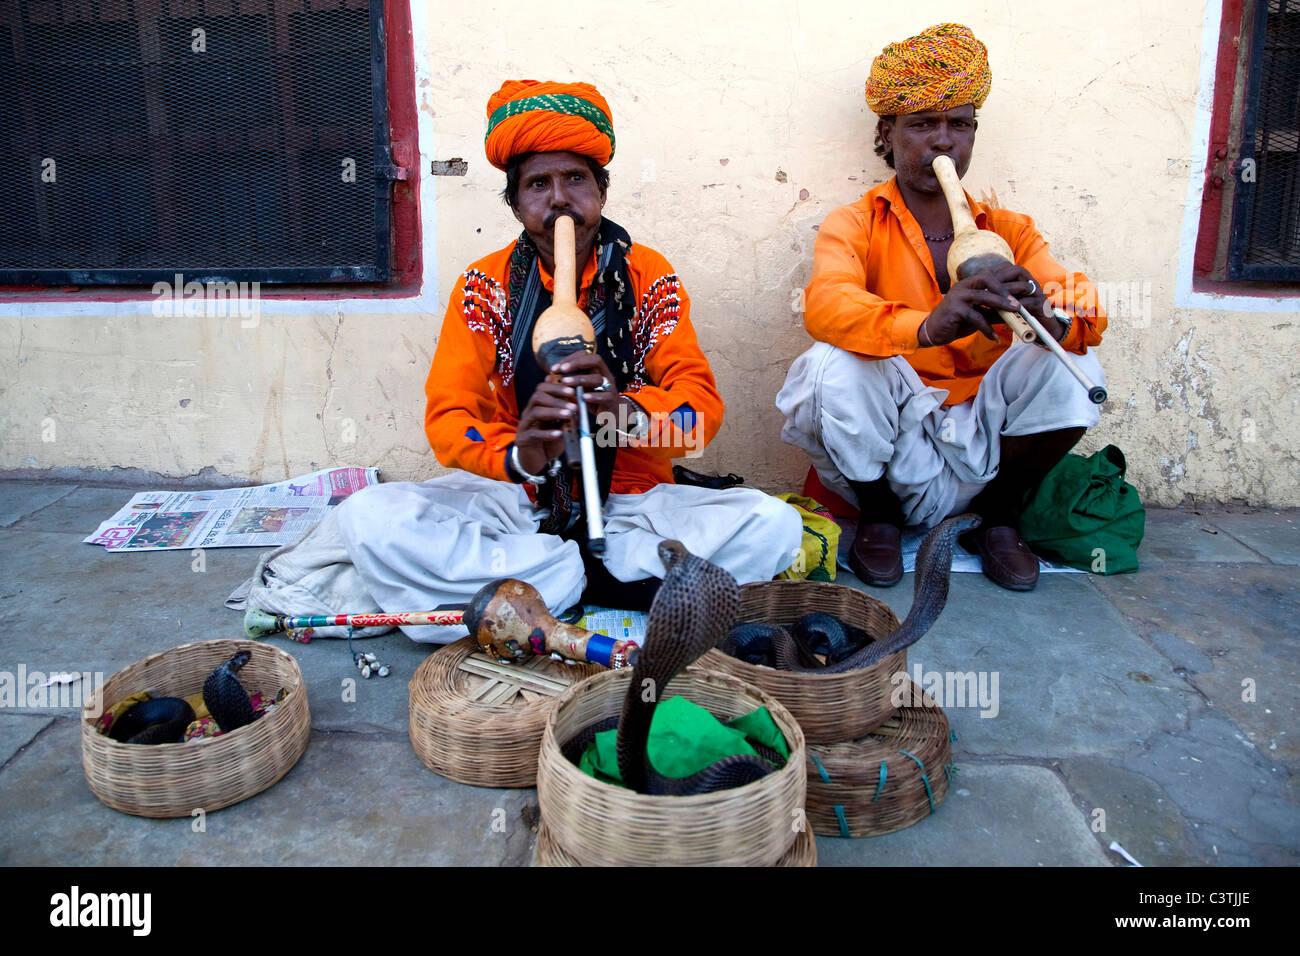 Incantatori di serpenti, Jaipur, Rajasthan, India, Asia Immagini Stock